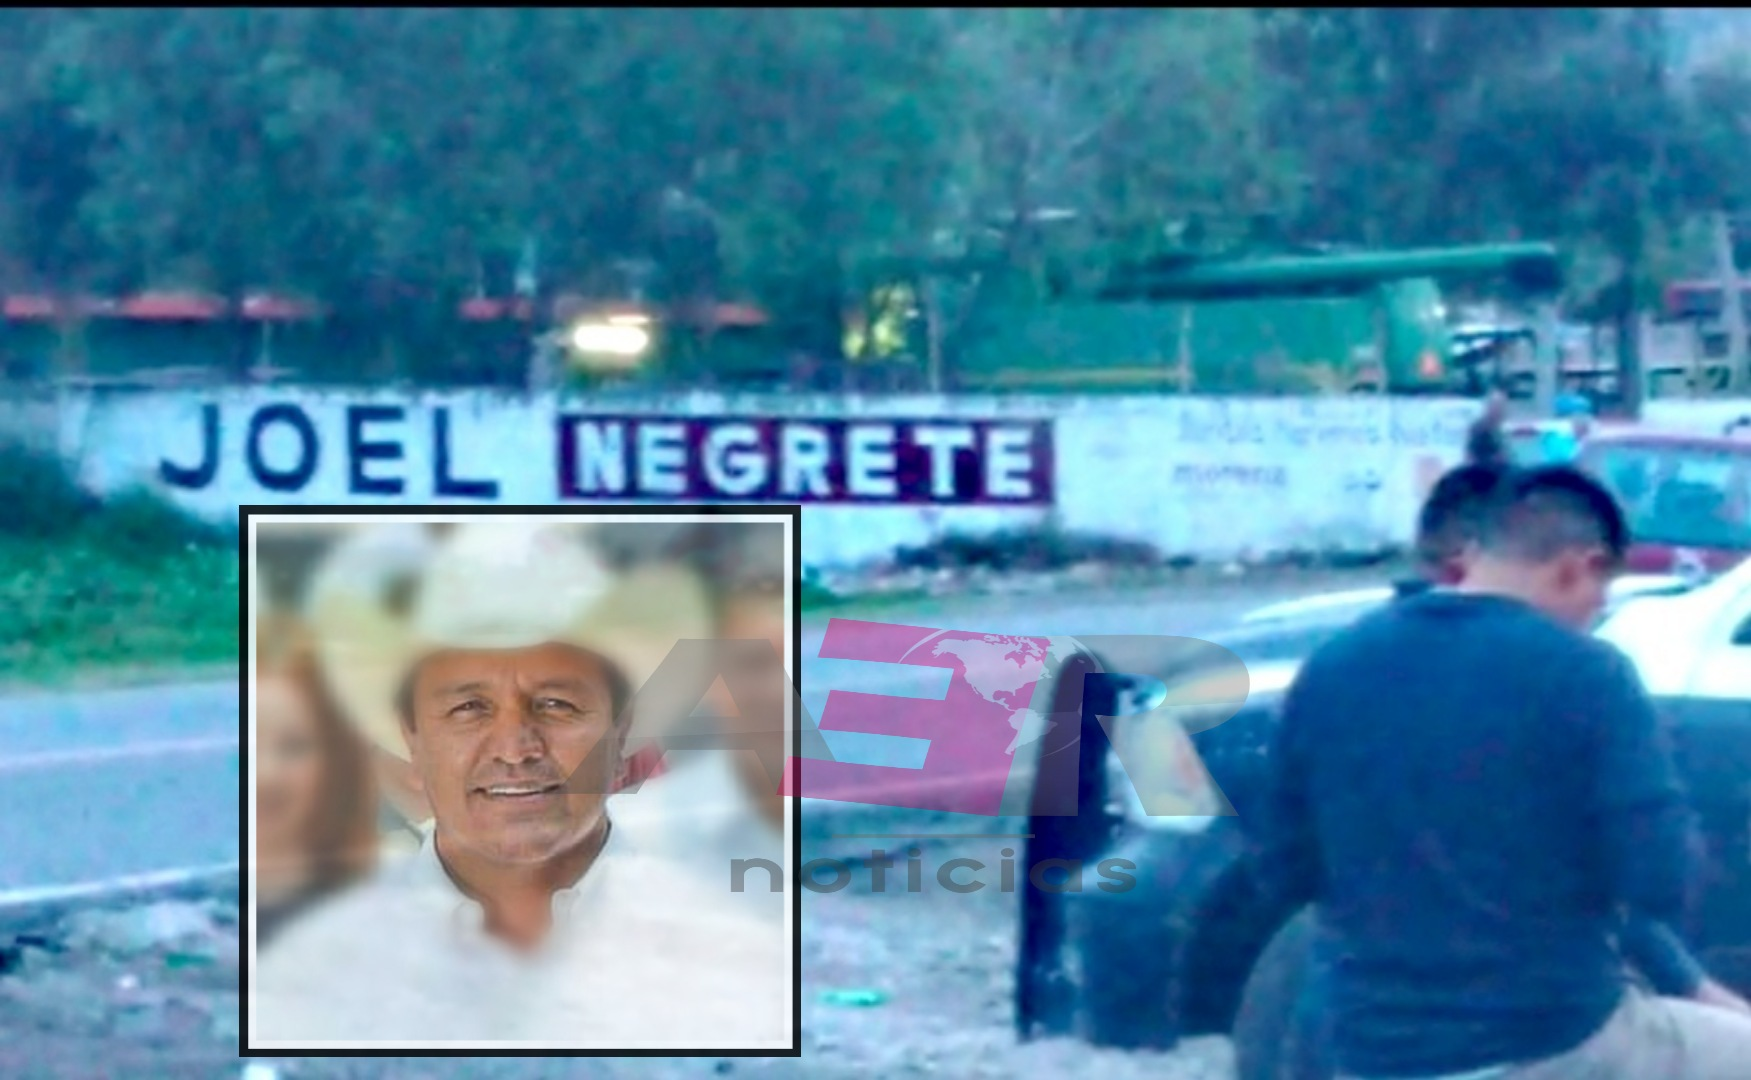 Ejecutan a ex candidato de Morena en Abasolo, Joel Negrete Barrera 3